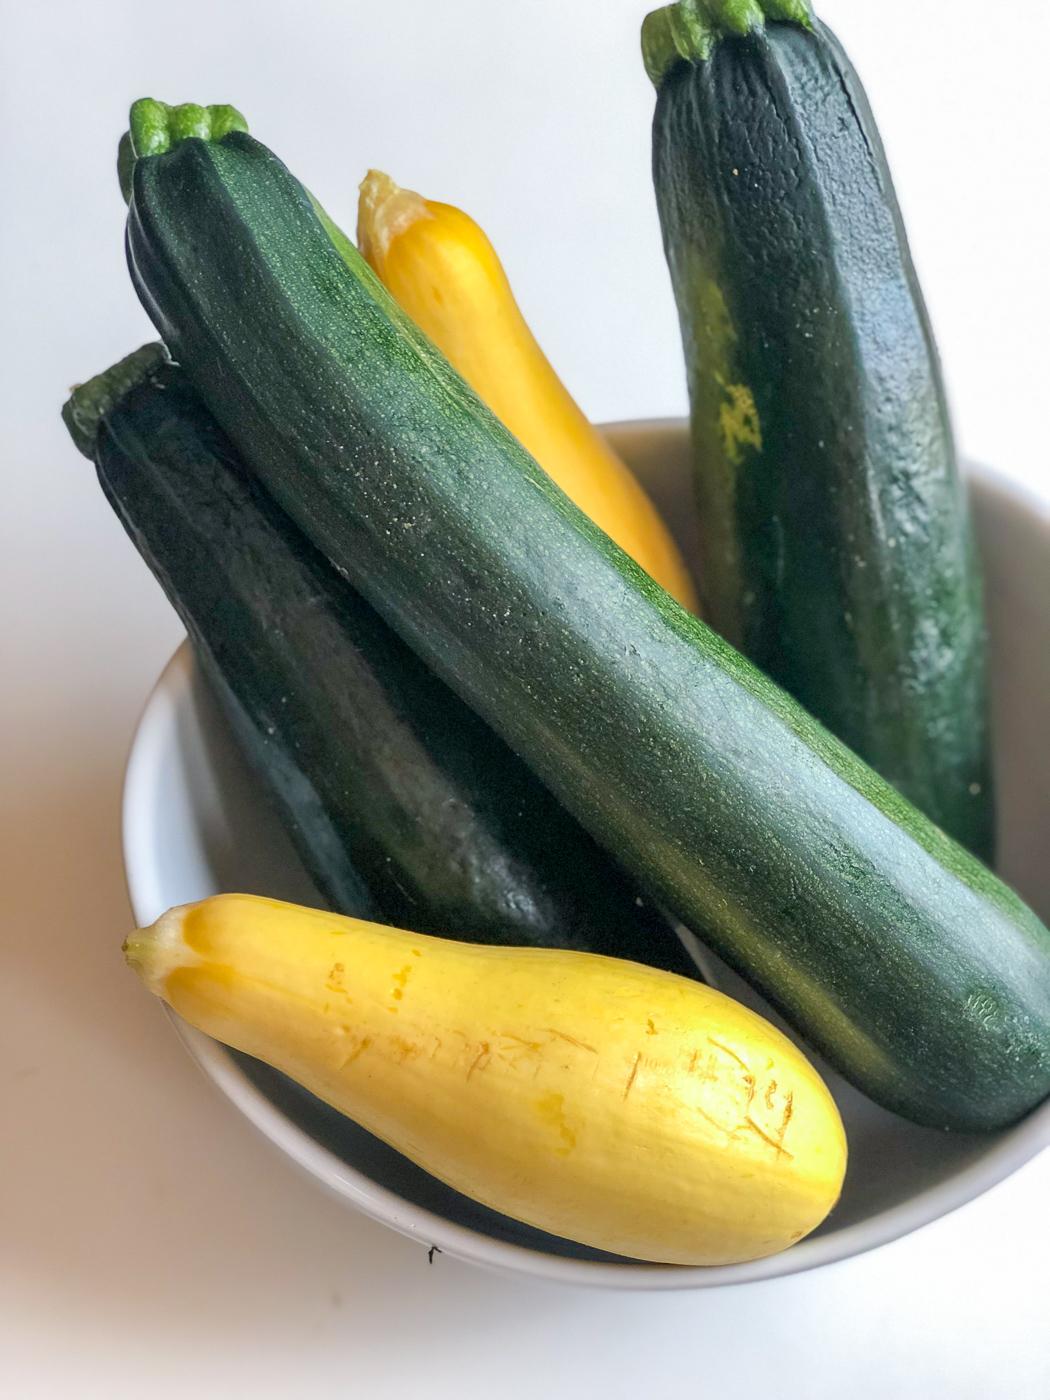 Meet Your Ingredients: Zucchini